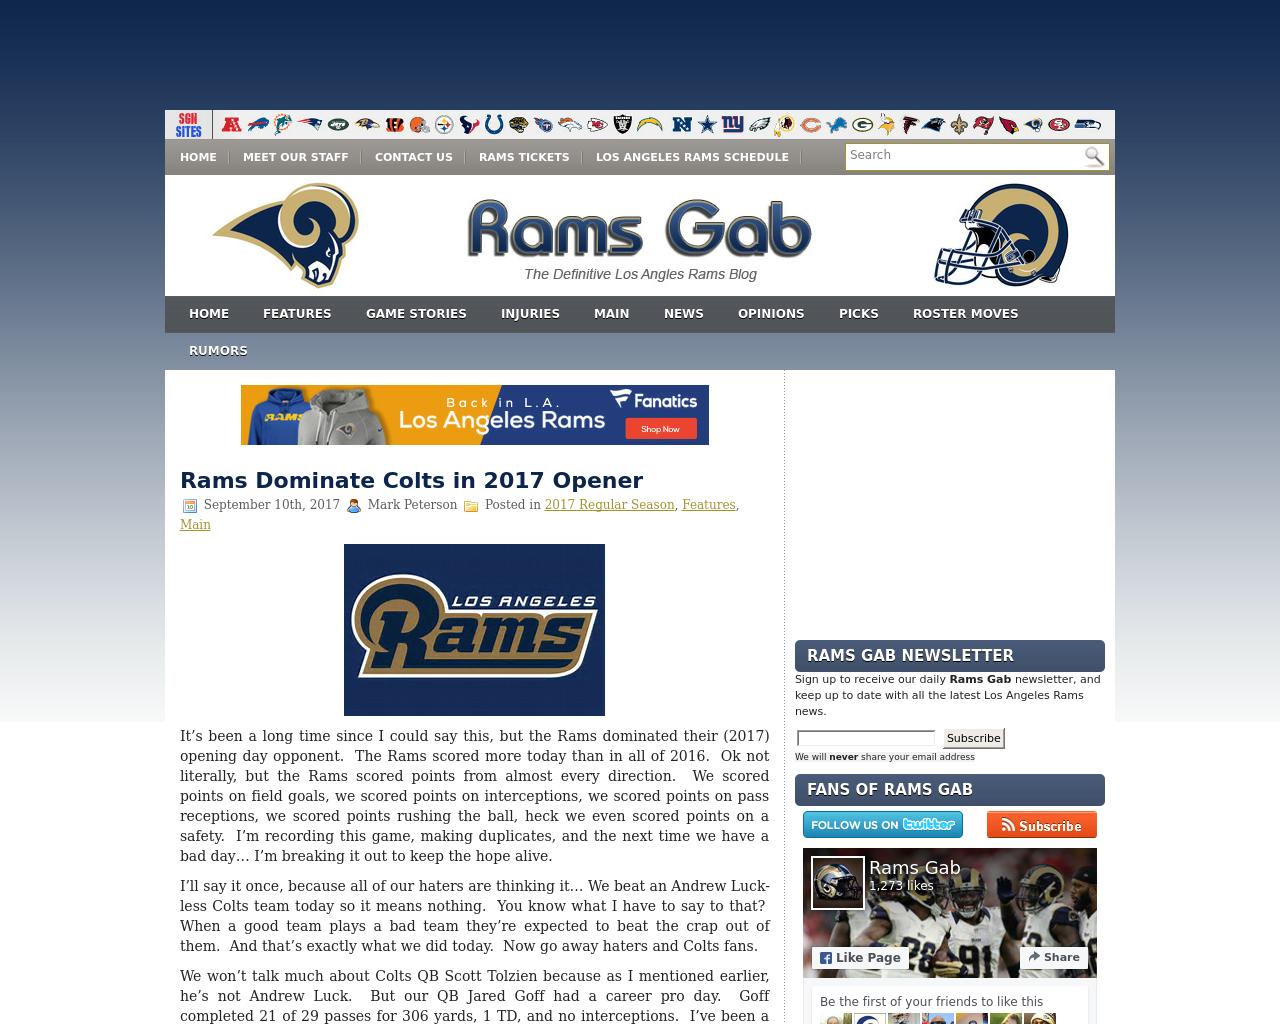 Rams-Gab-Advertising-Reviews-Pricing